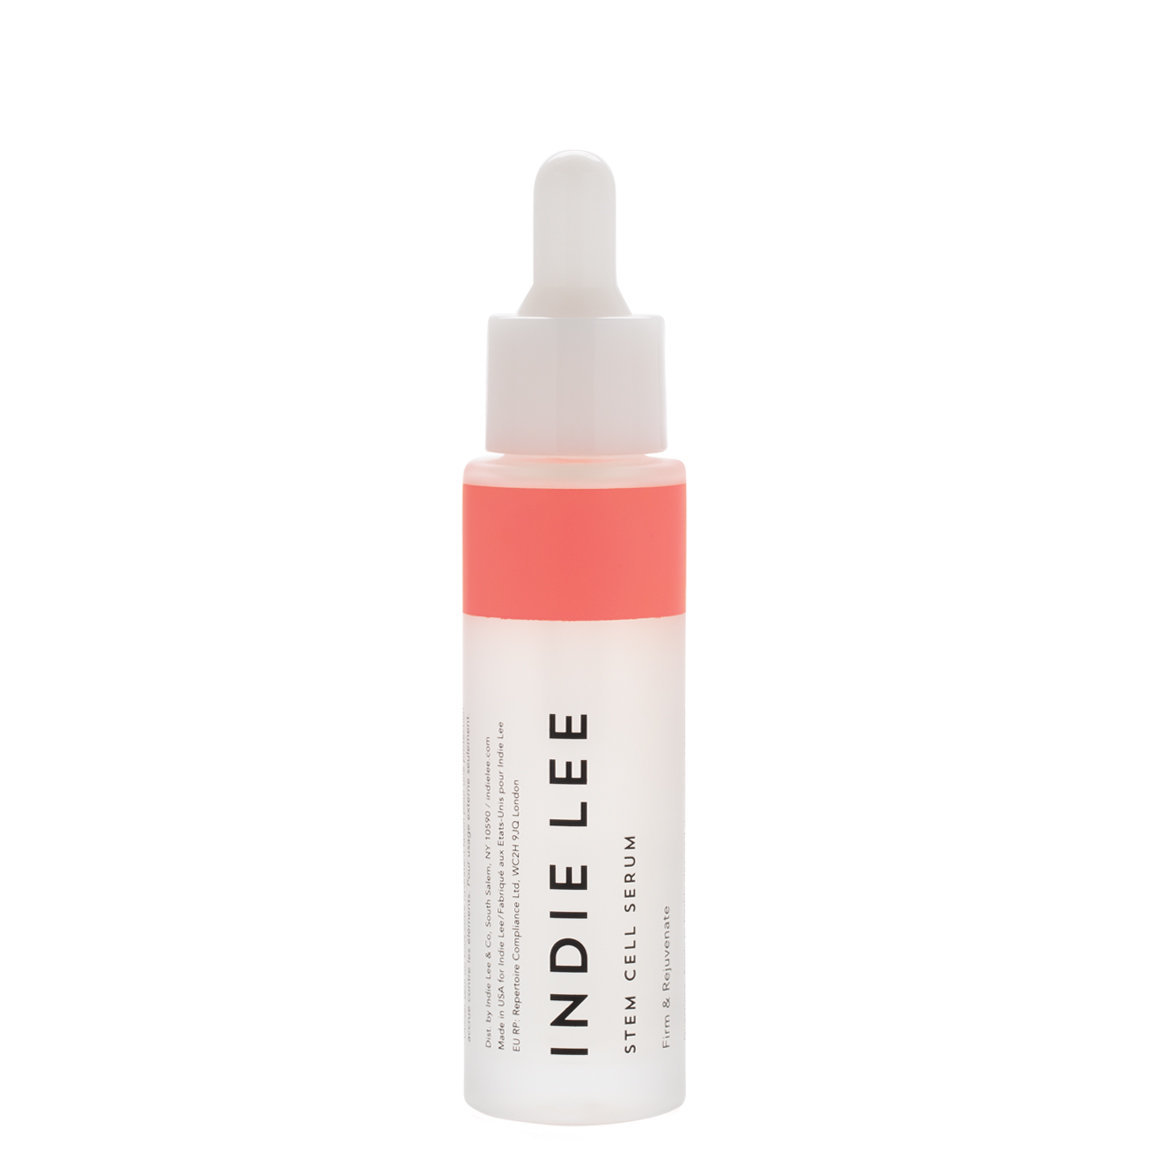 Indie Lee Stem Cell Serum 30 ml product swatch.